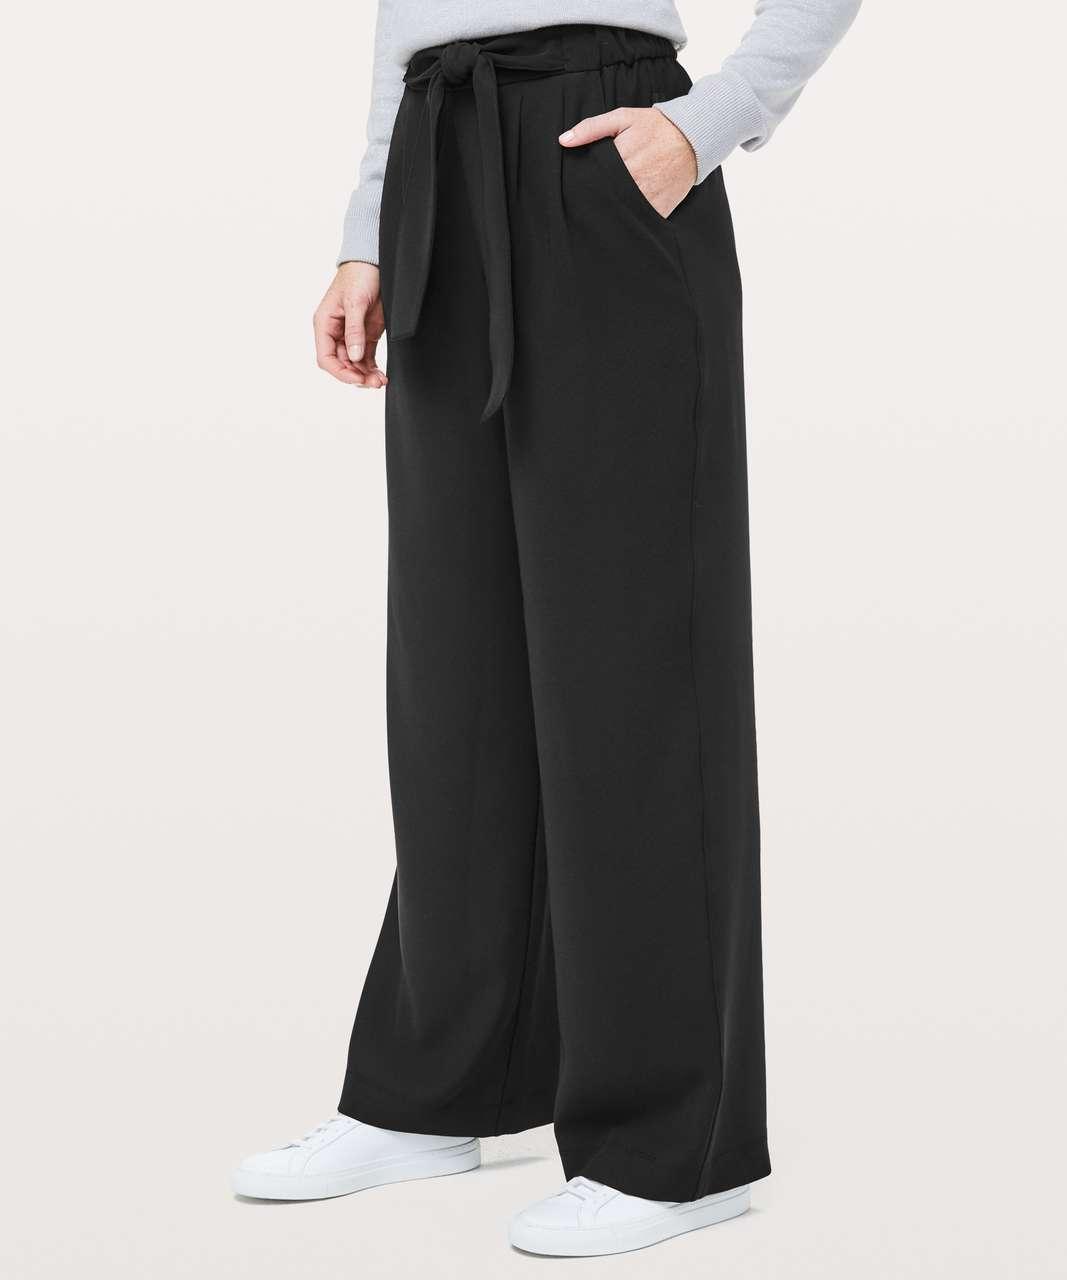 fa71101b2174f Lululemon Noir Pant *Woven - Black - lulu fanatics